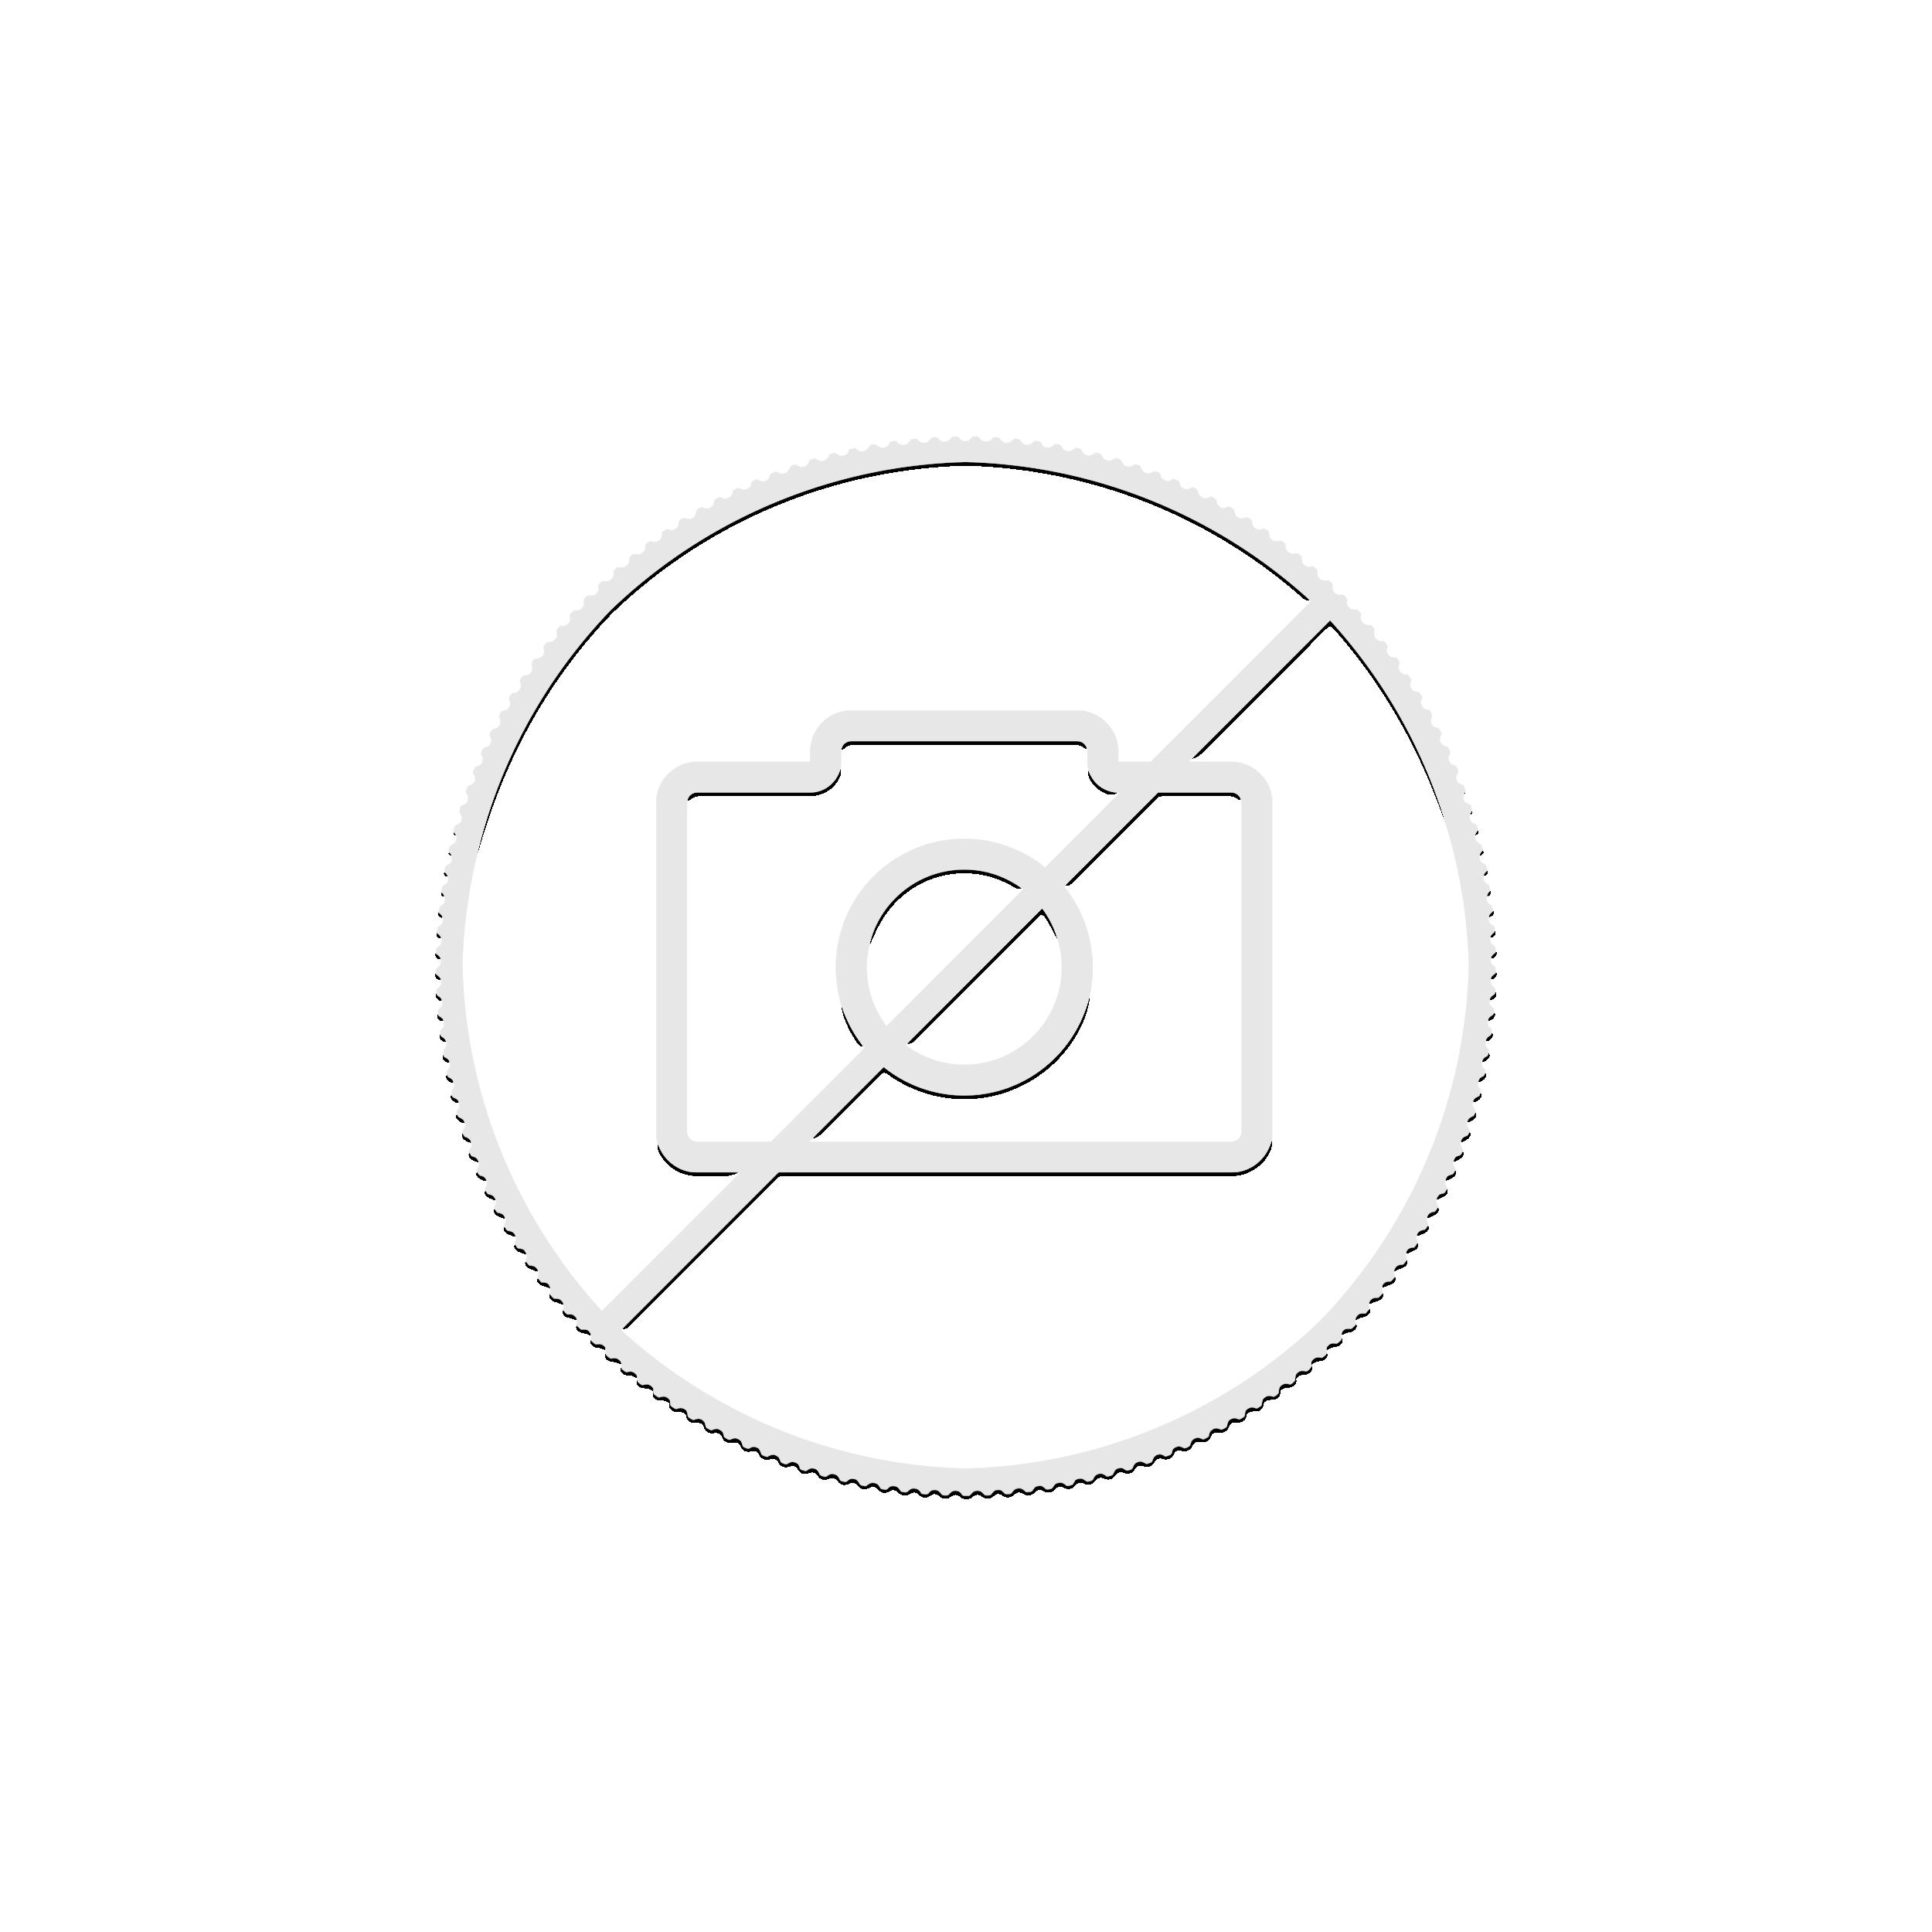 1 troy ounce zilver Britannia 2020 munt